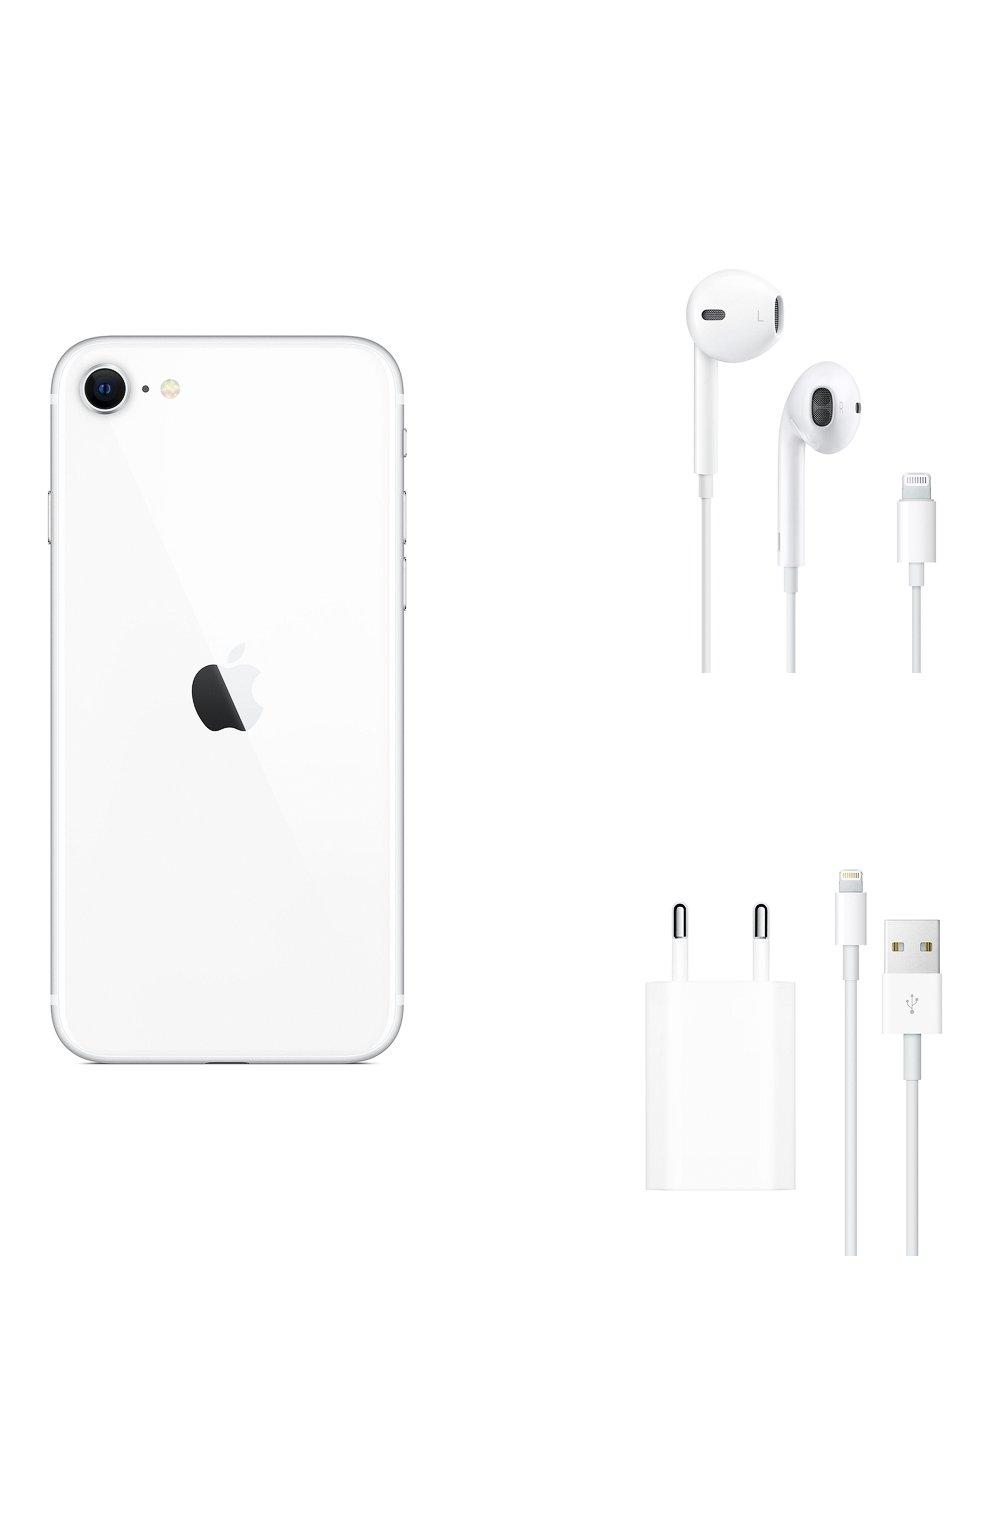 Мужской iphone se (2020) 128gb white APPLE  white цвета, арт. MXD12RU/A | Фото 6